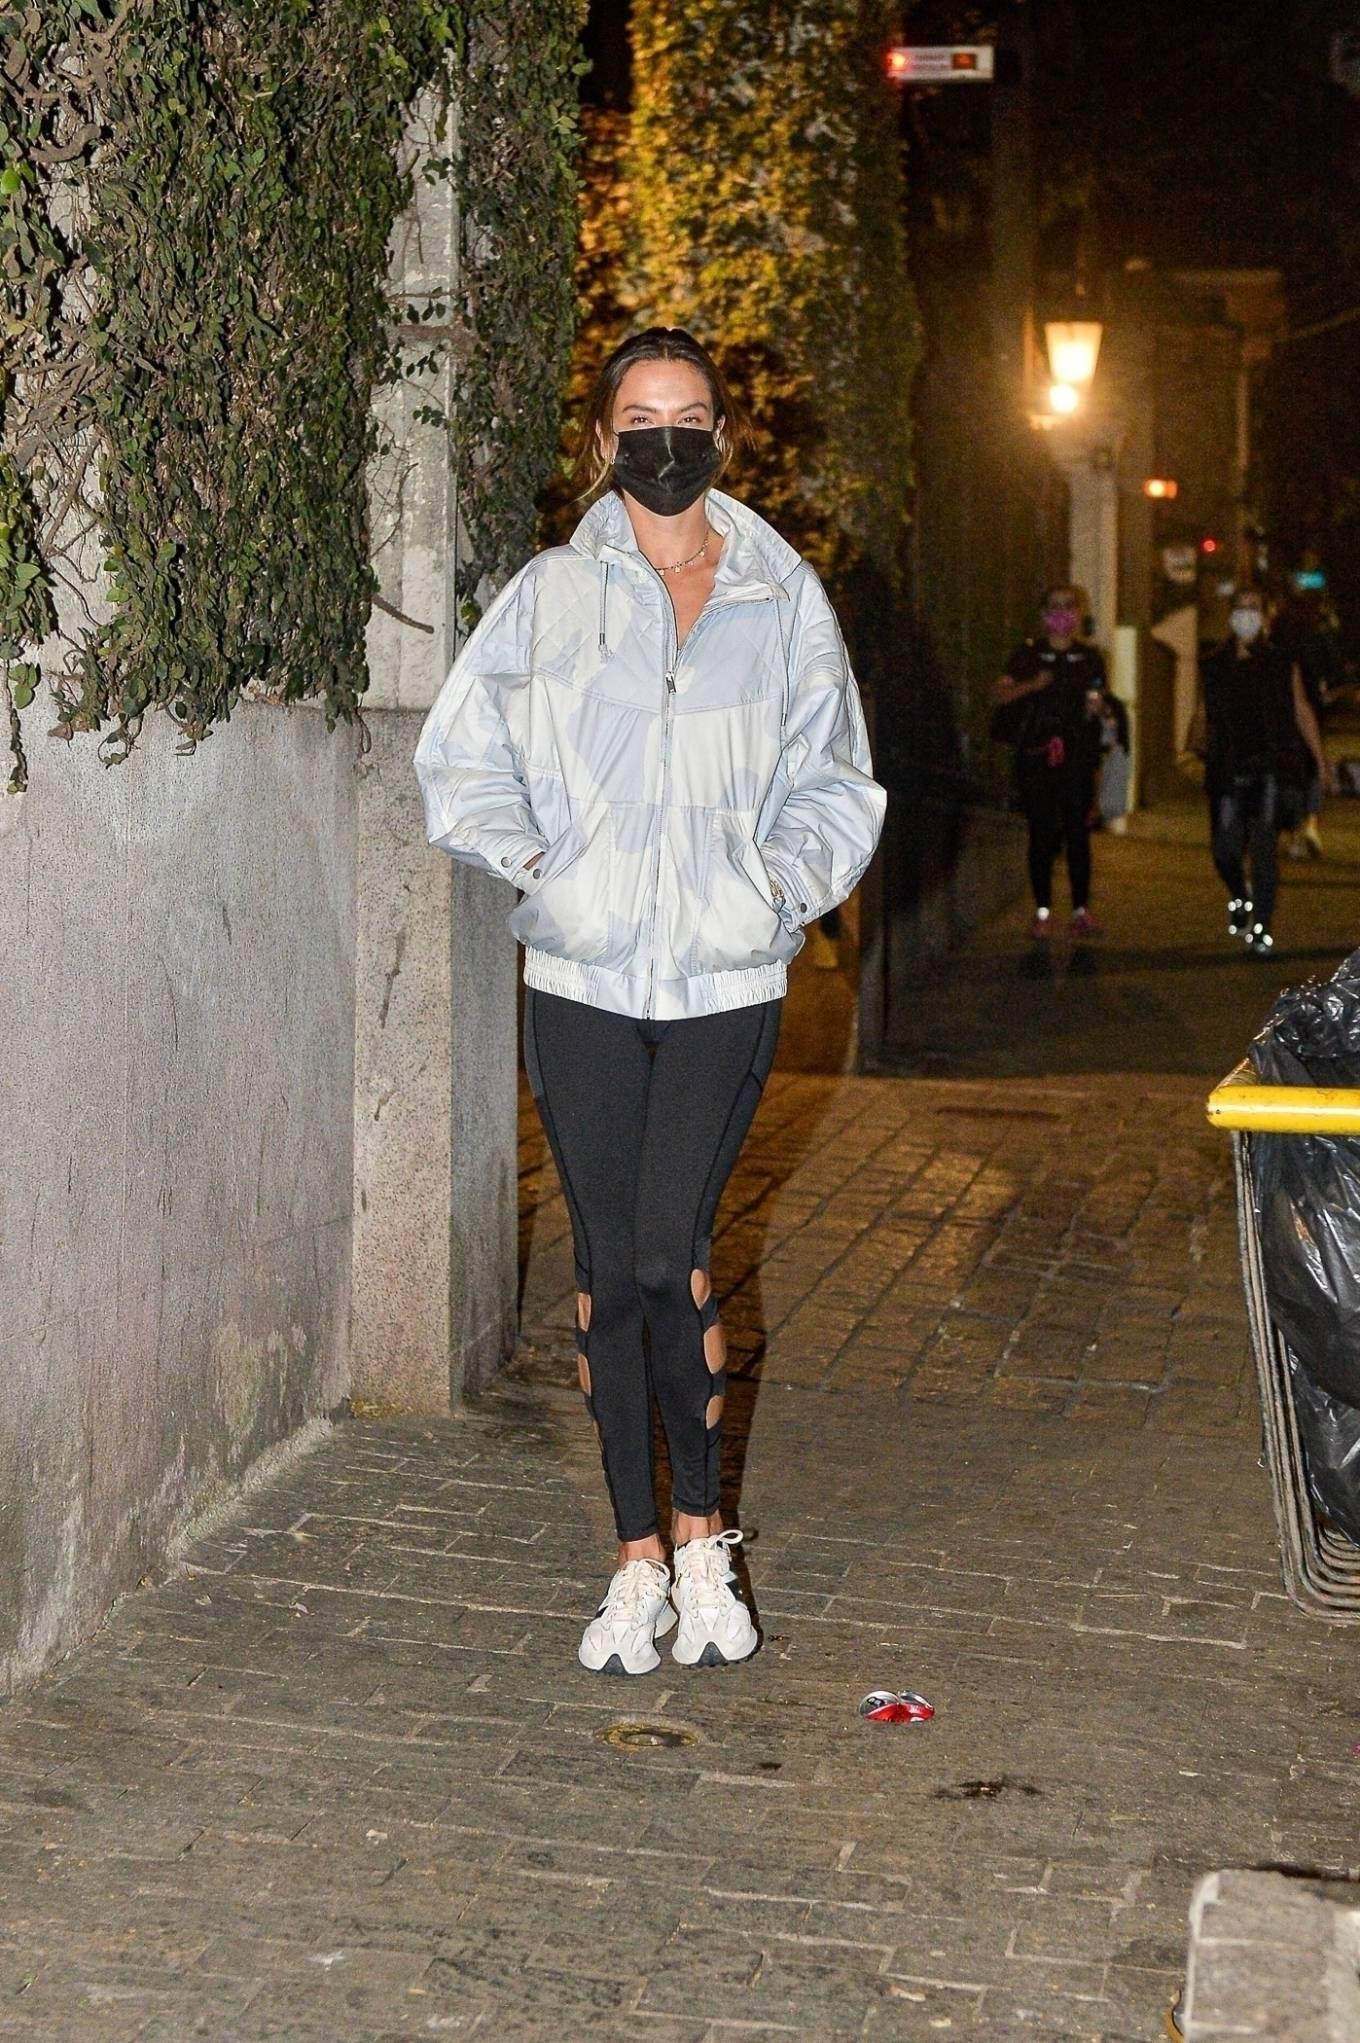 Alessandra-Ambrosio-white-and-black-sneakers-street-style-autumn-winter-2021